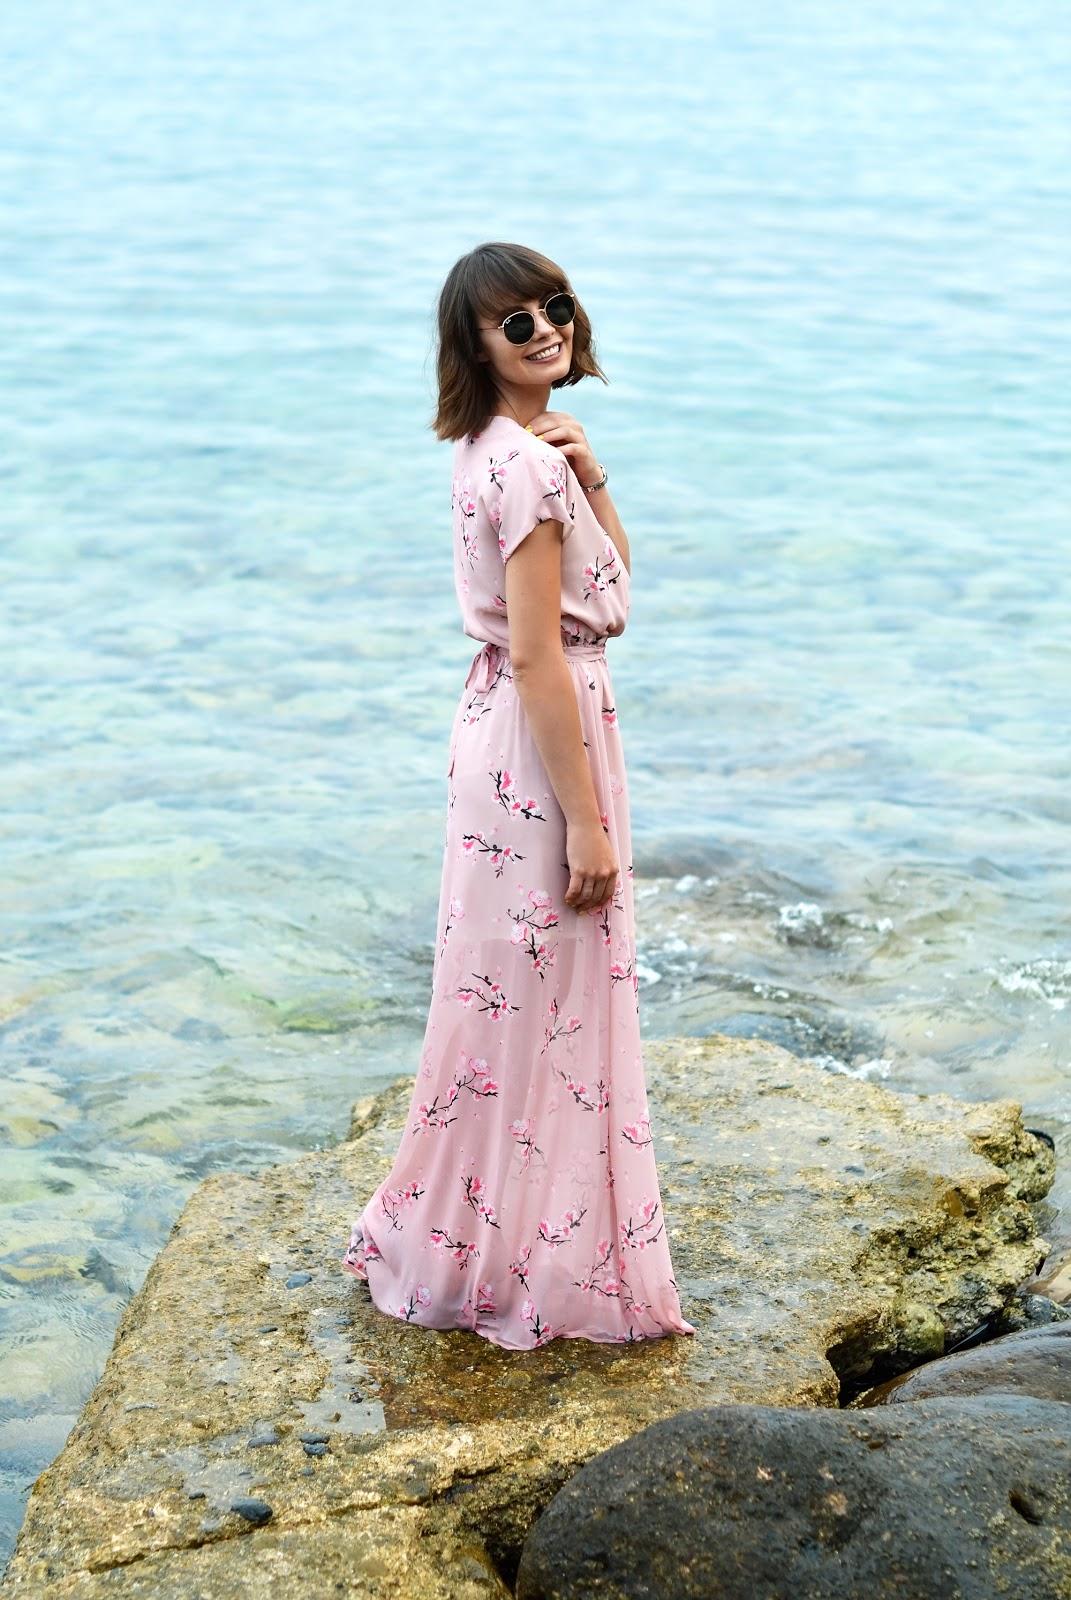 blog o modzie | moda | psychologia | refleksja | ray ban